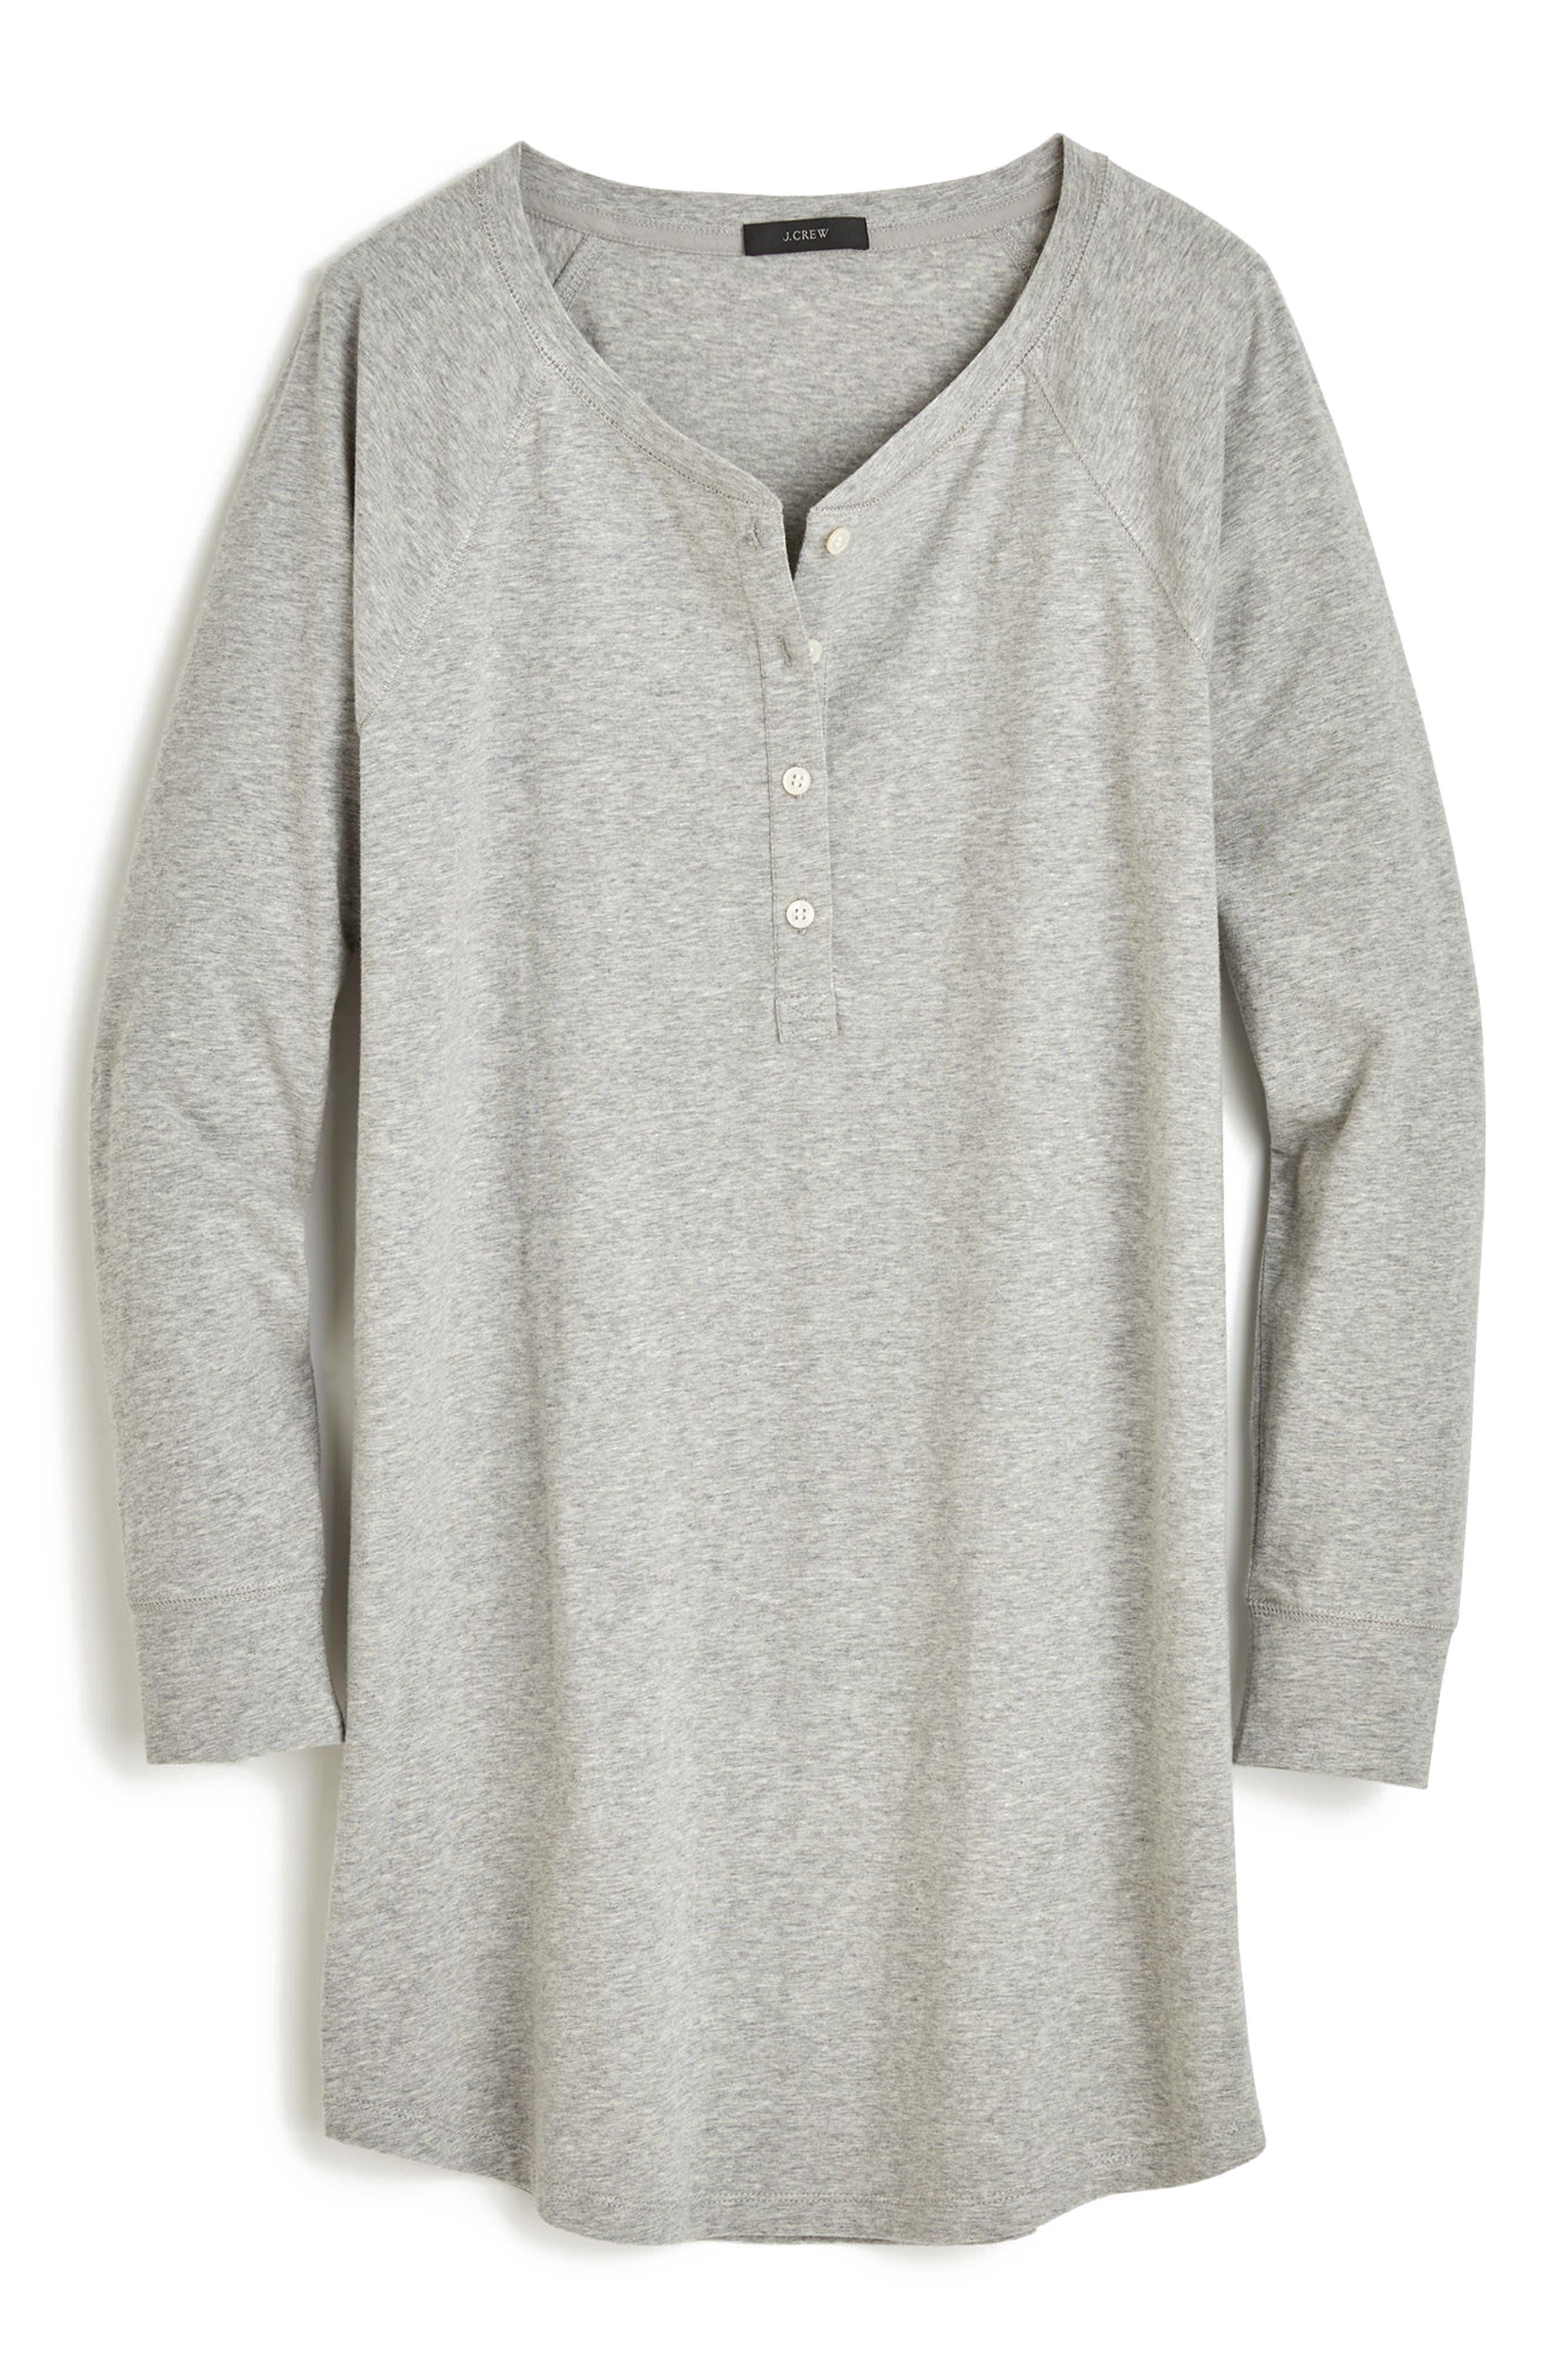 Knit Sleep Shirt,                             Alternate thumbnail 4, color,                             Heather Grey